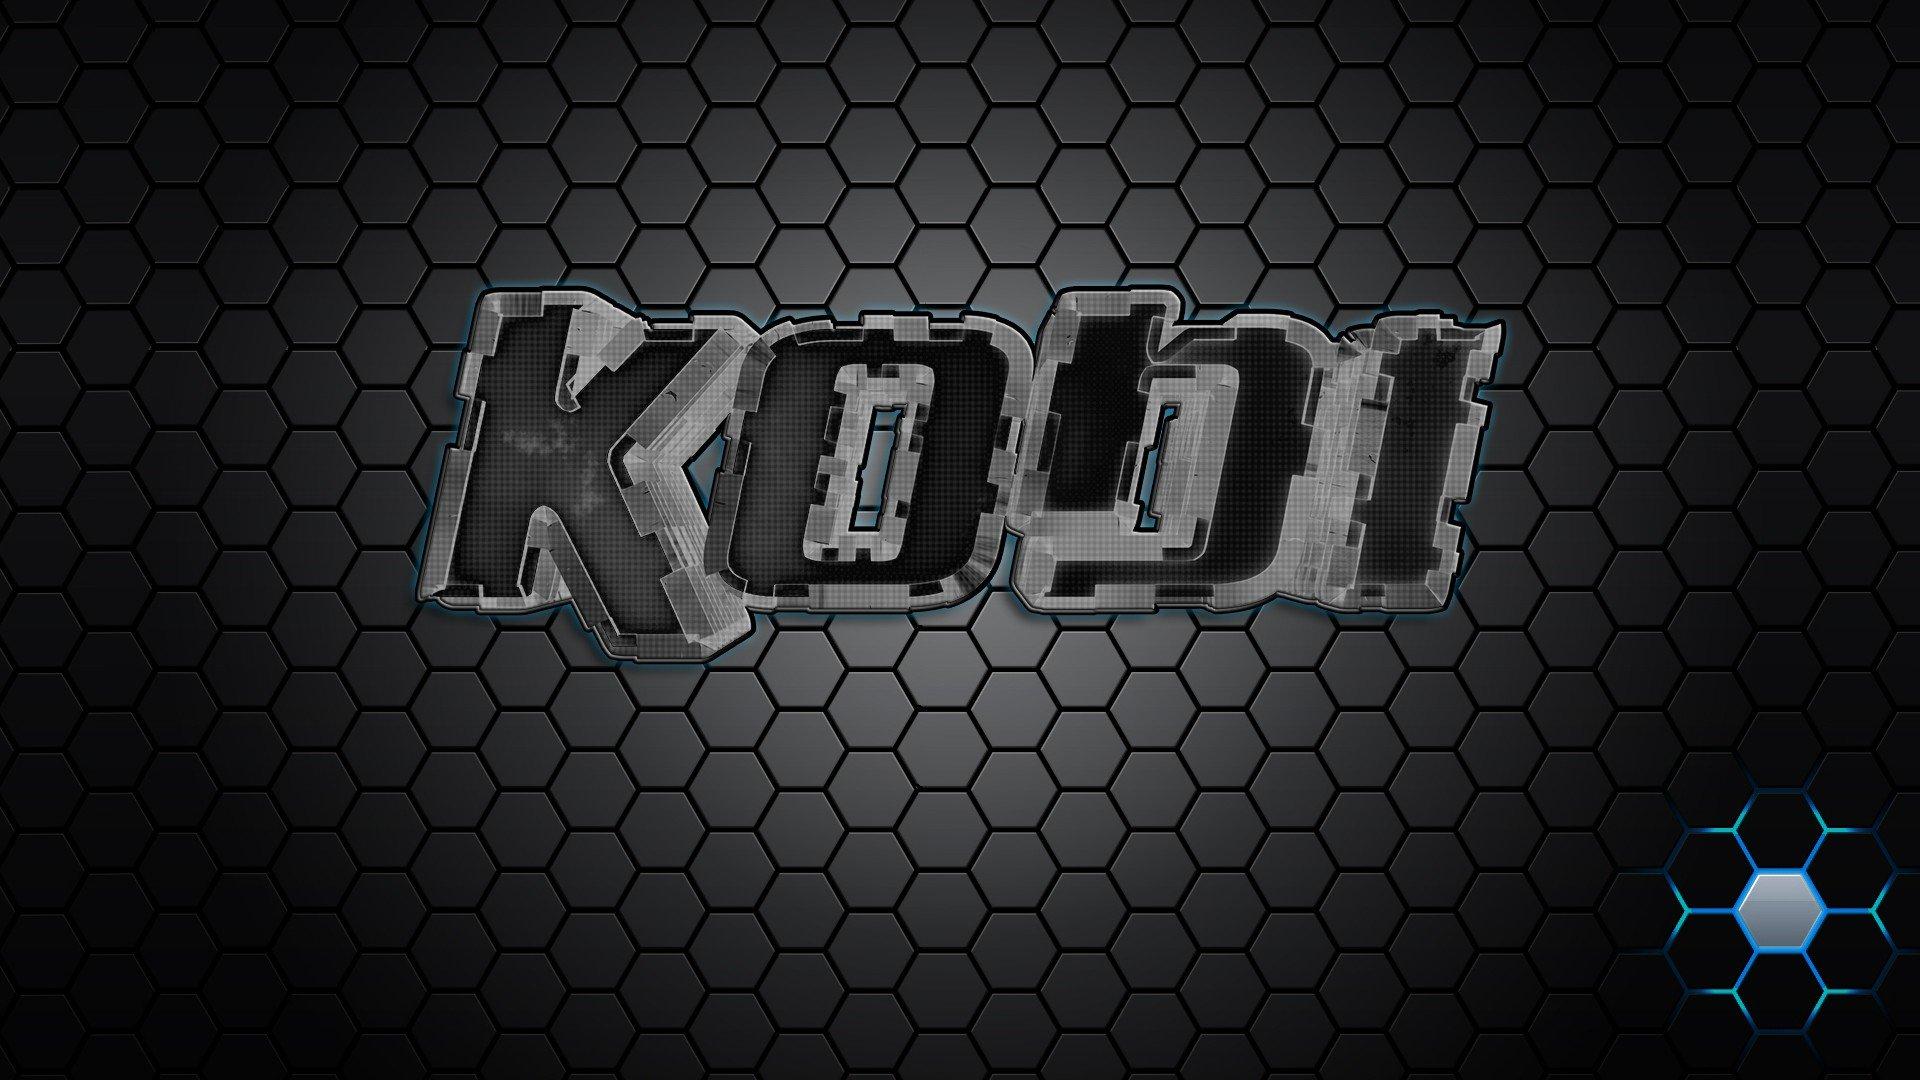 Kodi xbmc hd wallpapers desktop and mobile images photos - Kodi wallpaper ...